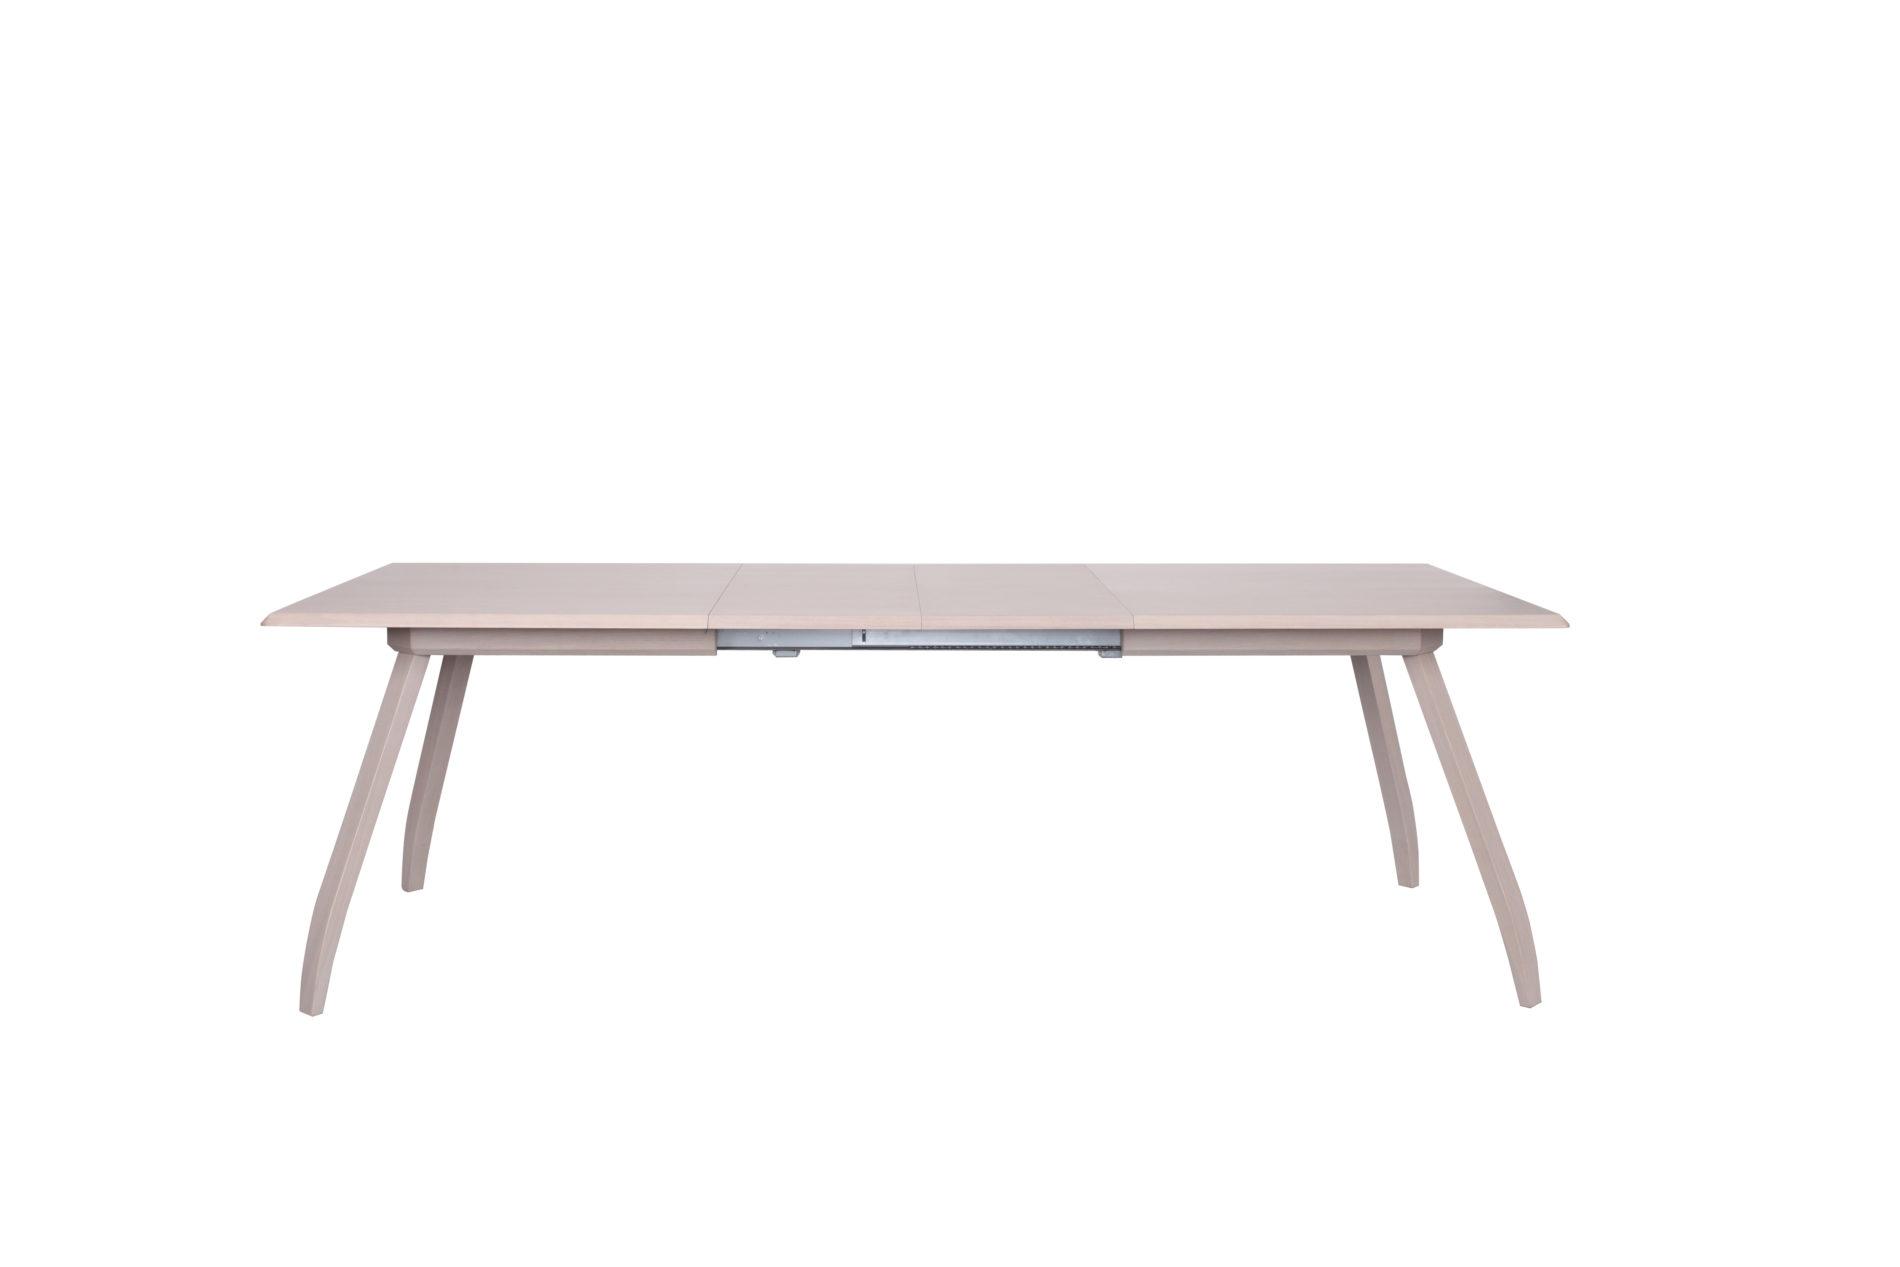 Vos stół A i B